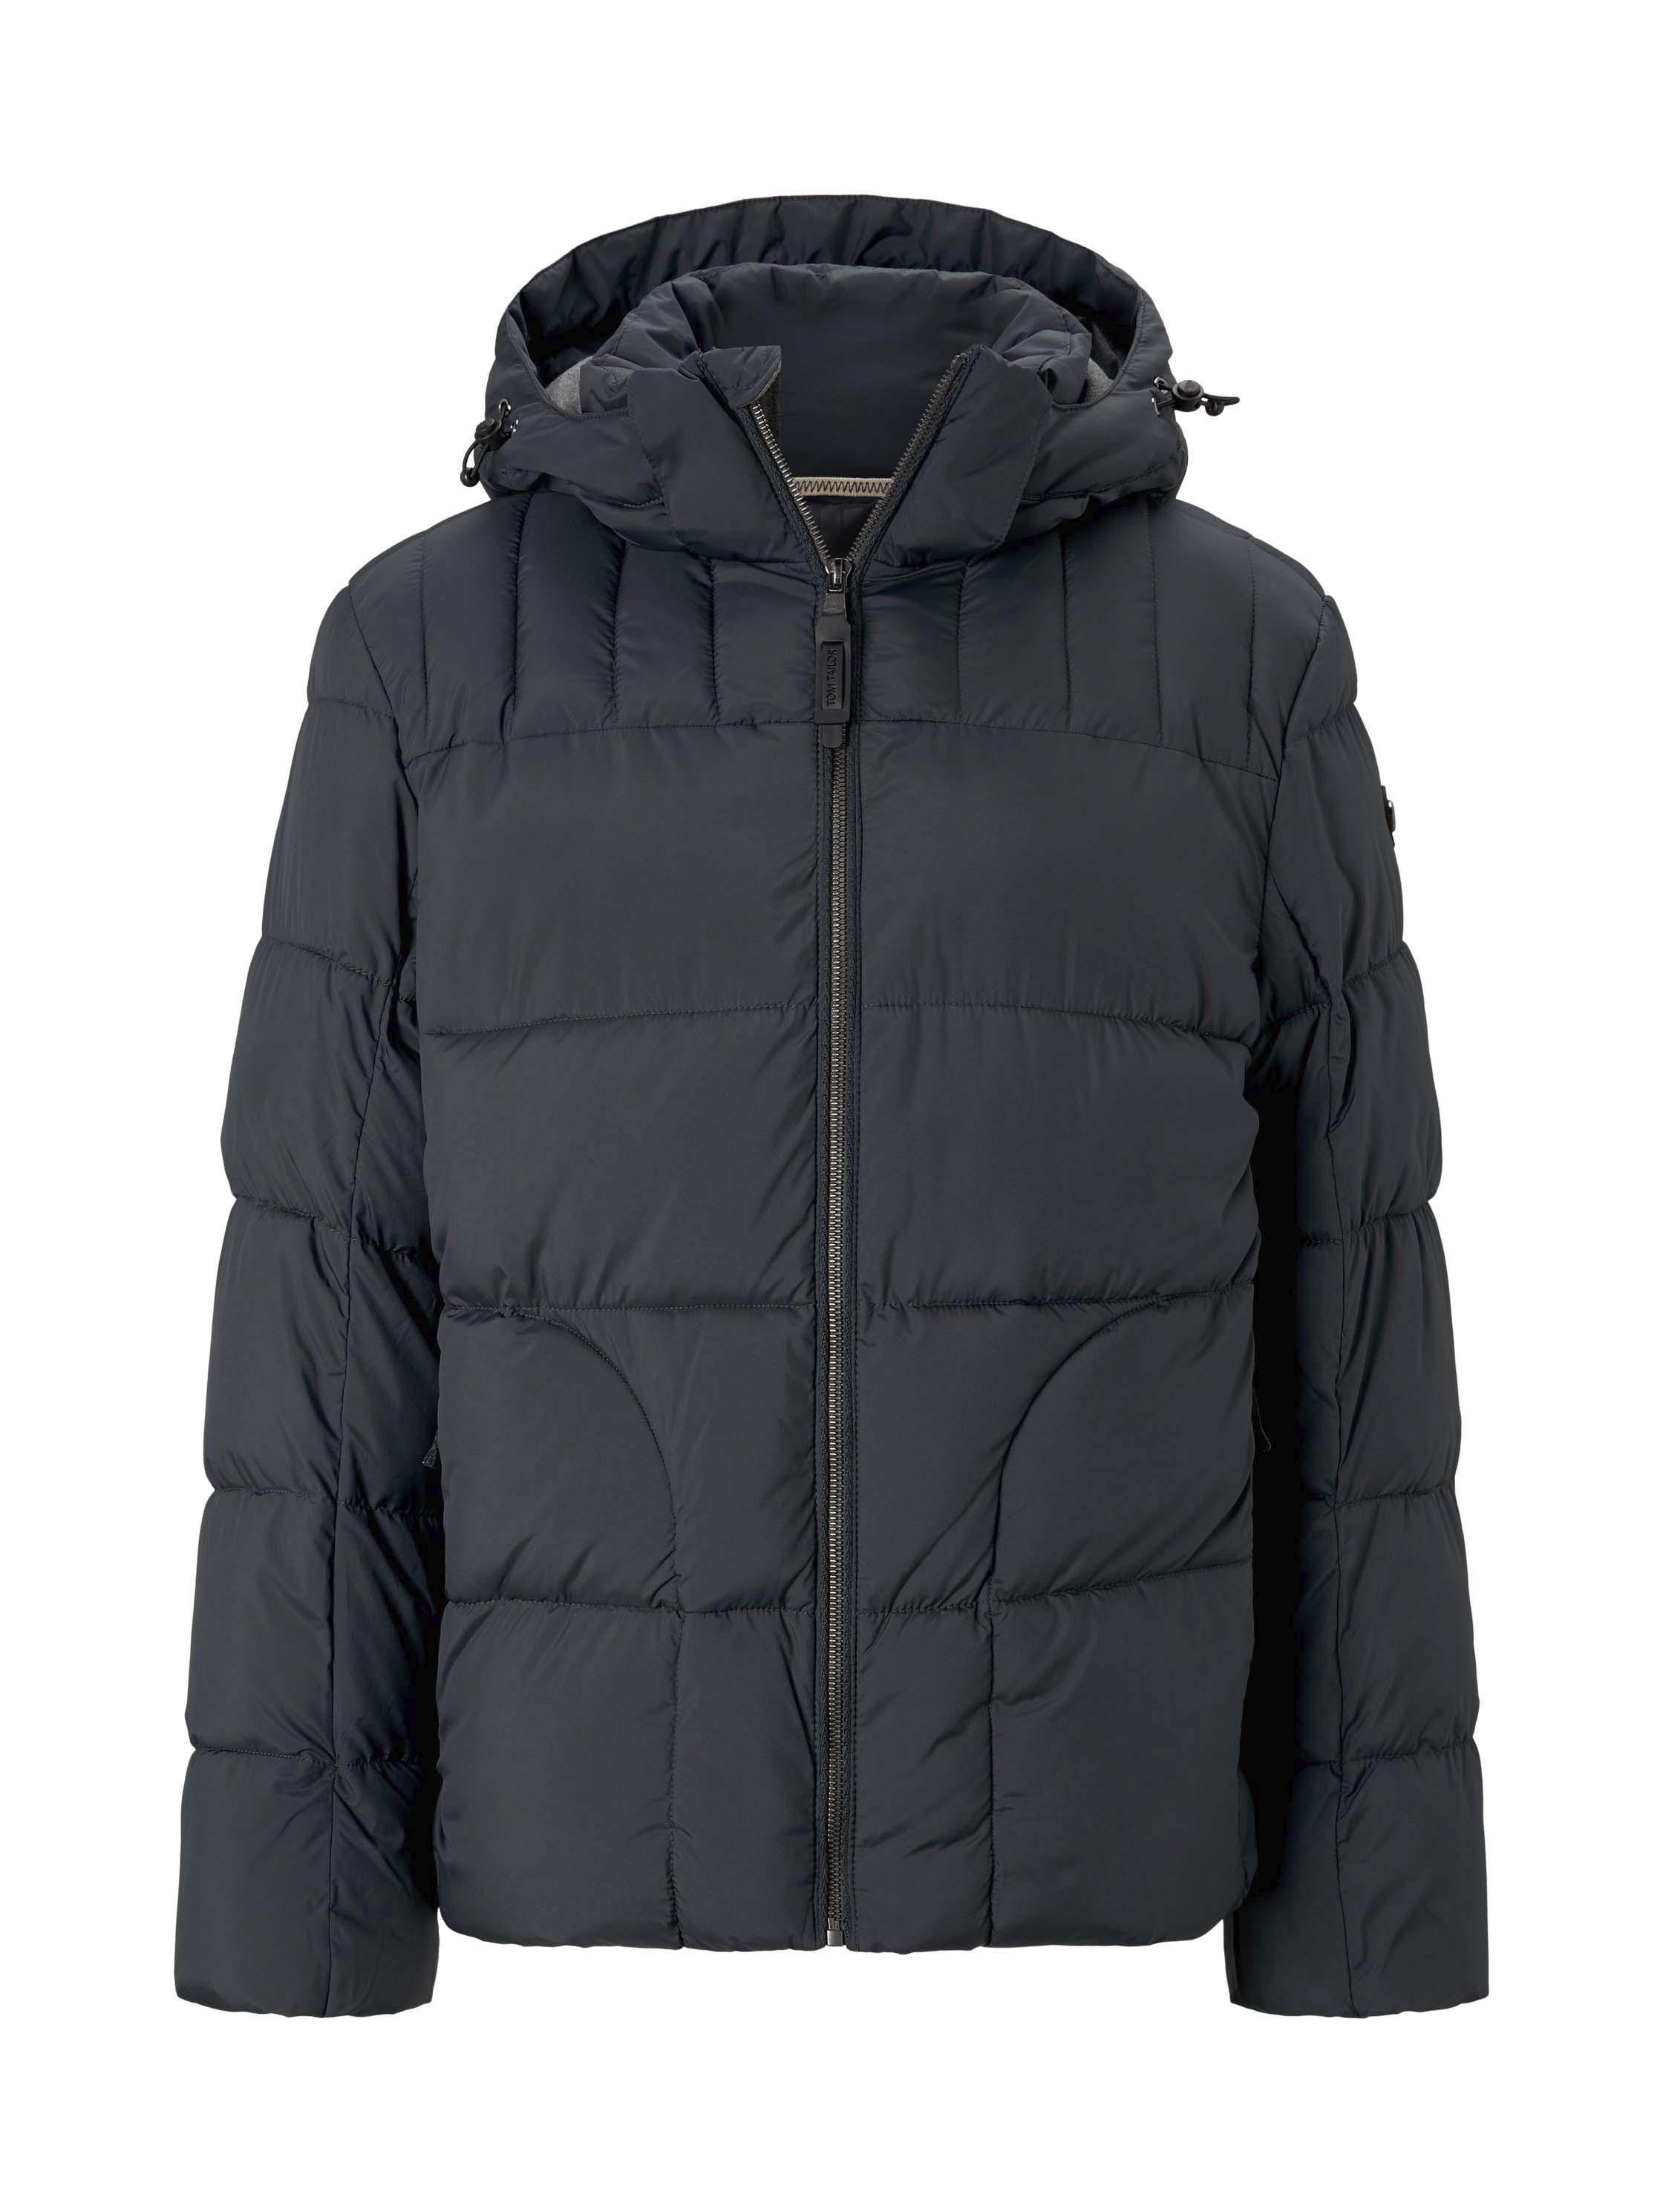 campaign puffer jacket, Dark Gable Green